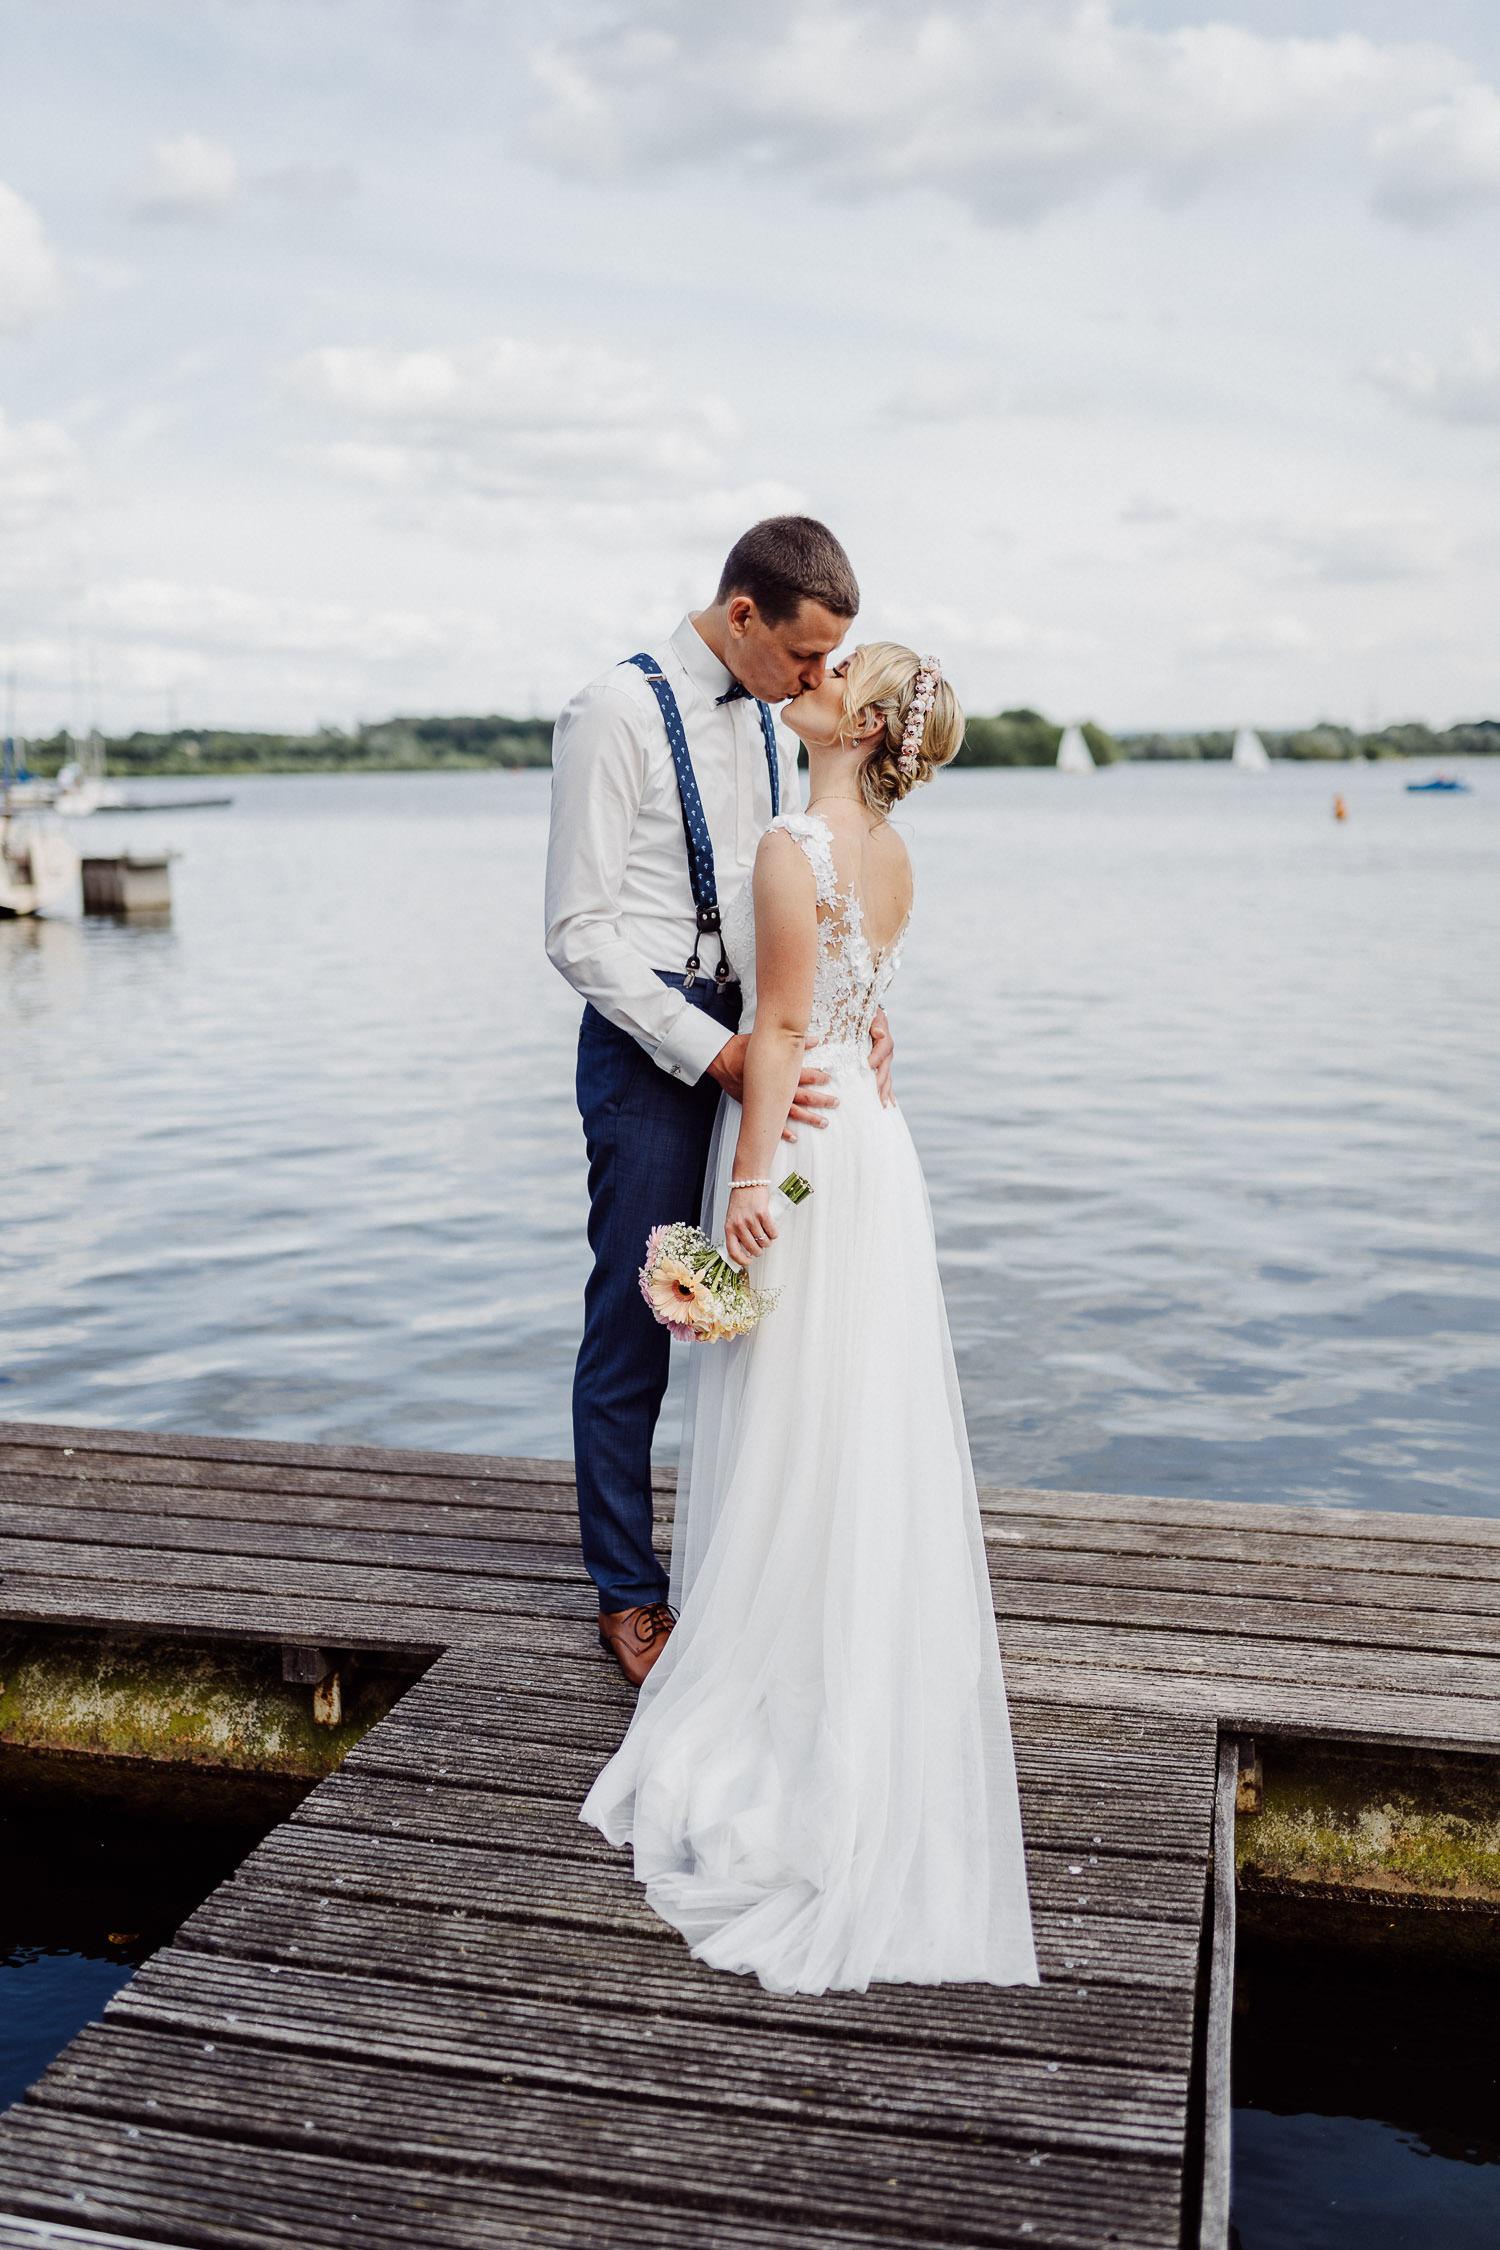 Brautpaar küßt sich auf Bootssteg